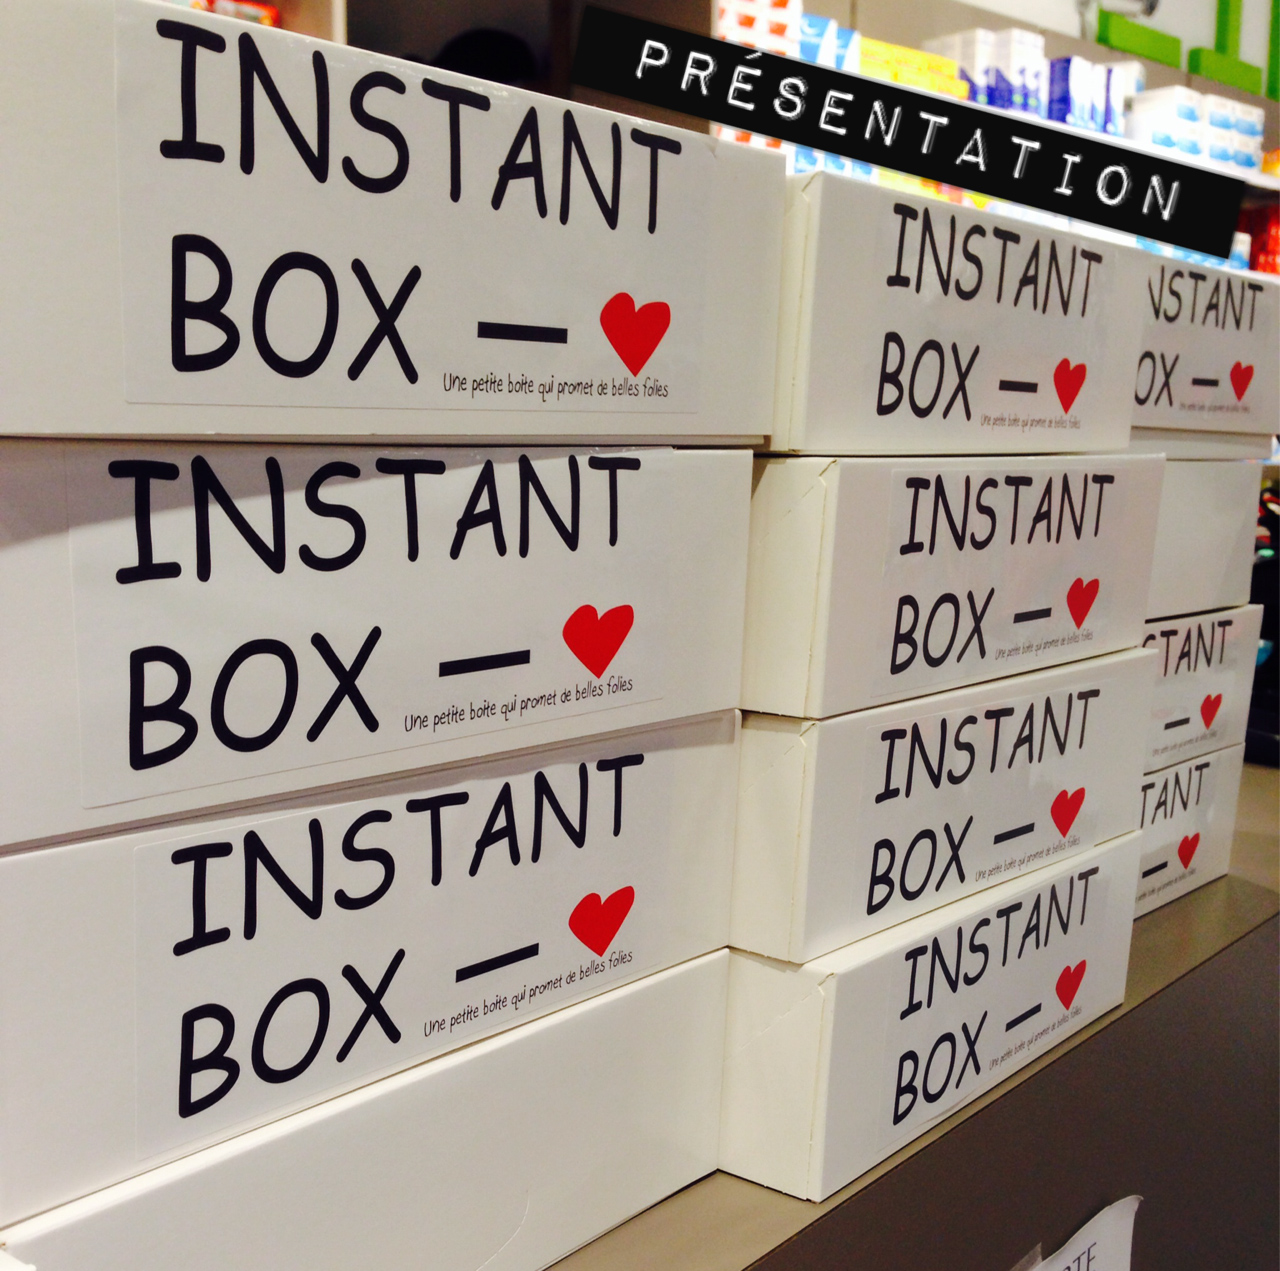 Instant box la box montpelli raine une pintade for Boite montpellier